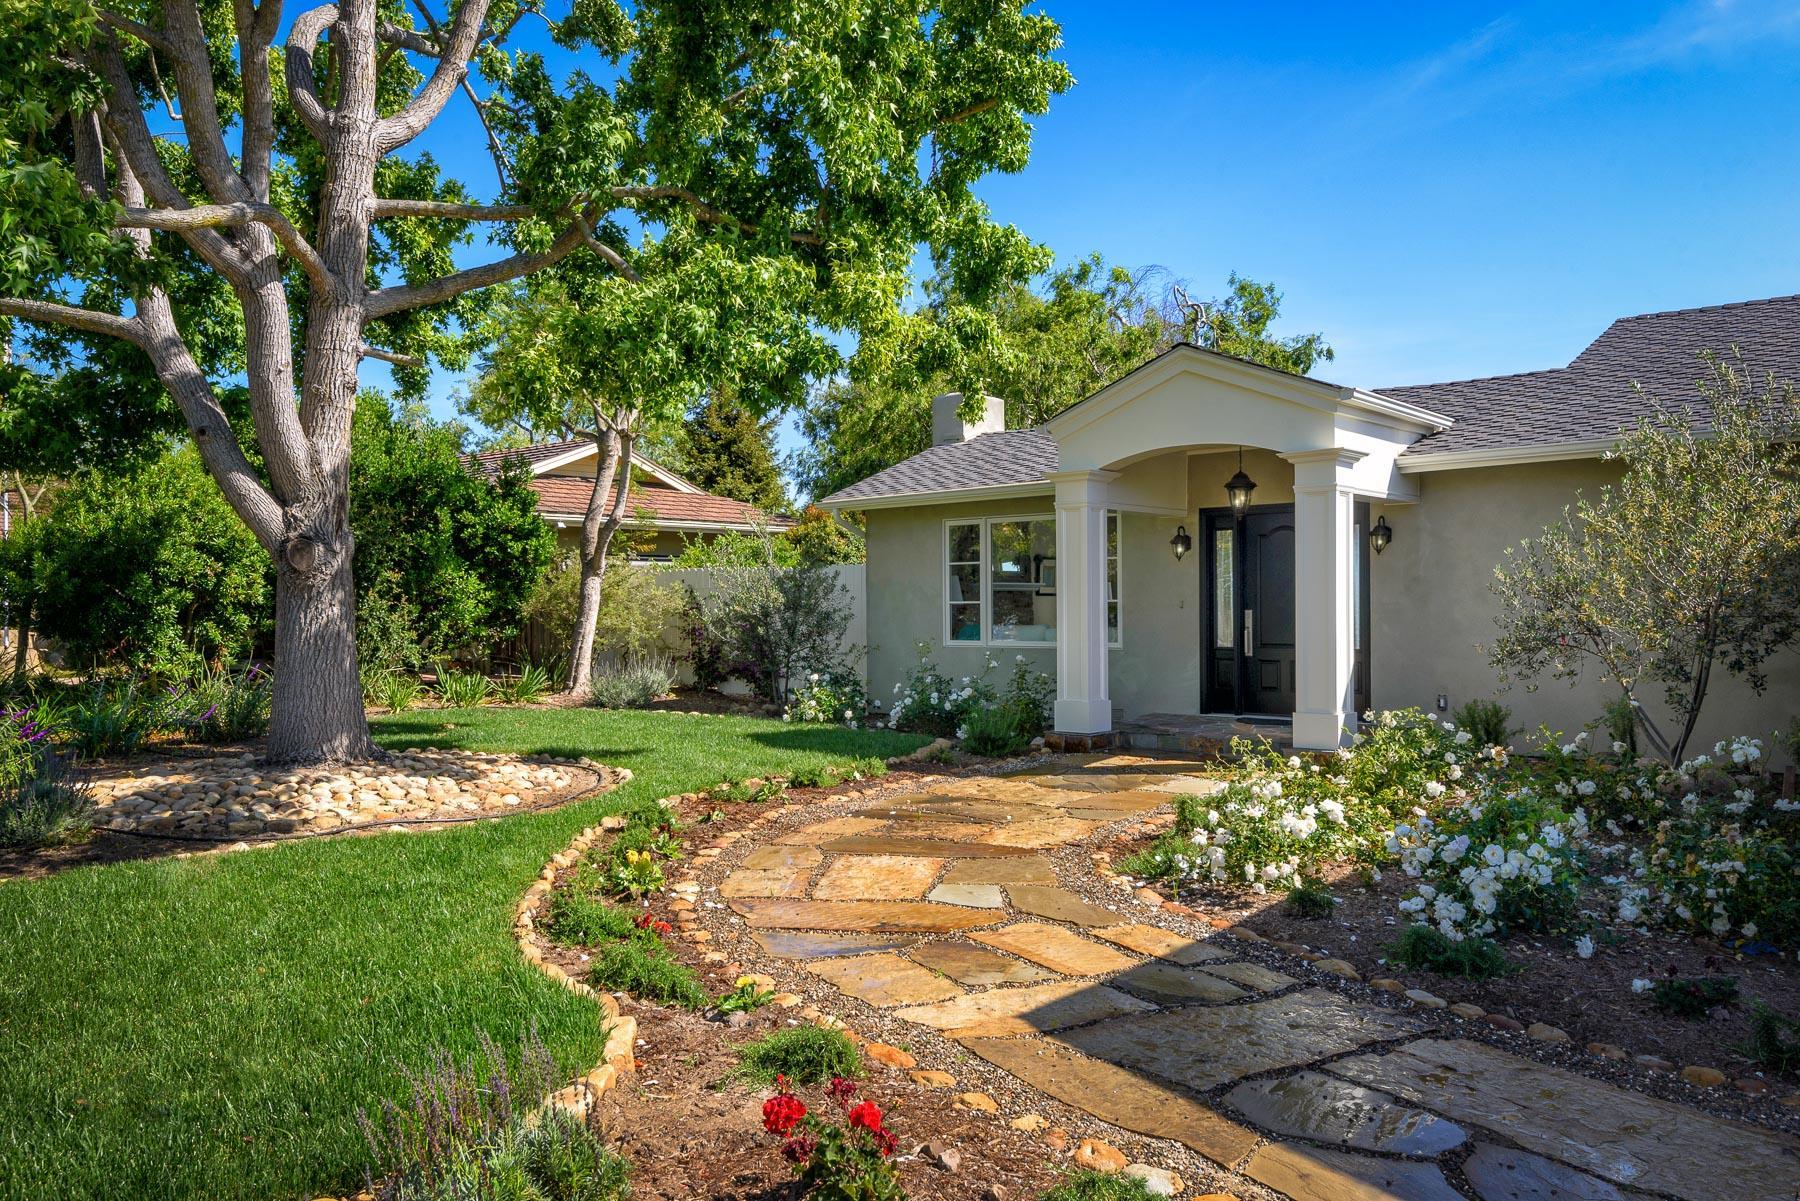 Property photo for 151 La Vista Grande Santa Barbara, California 93103 - 16-222